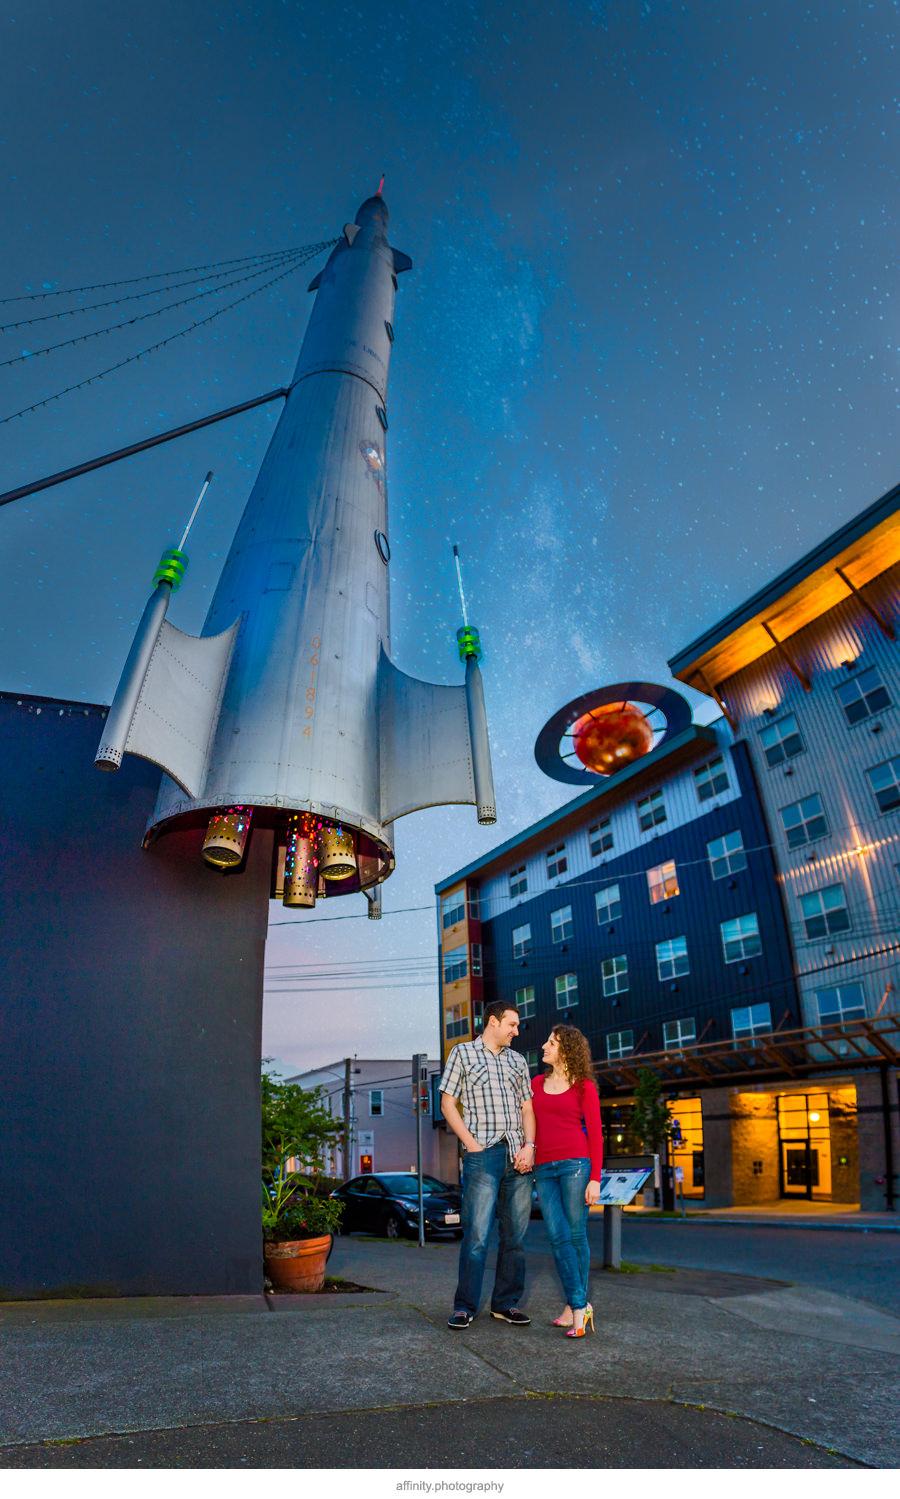 17-fremont-seattle-rocket-night-portraits-saturn.jpg